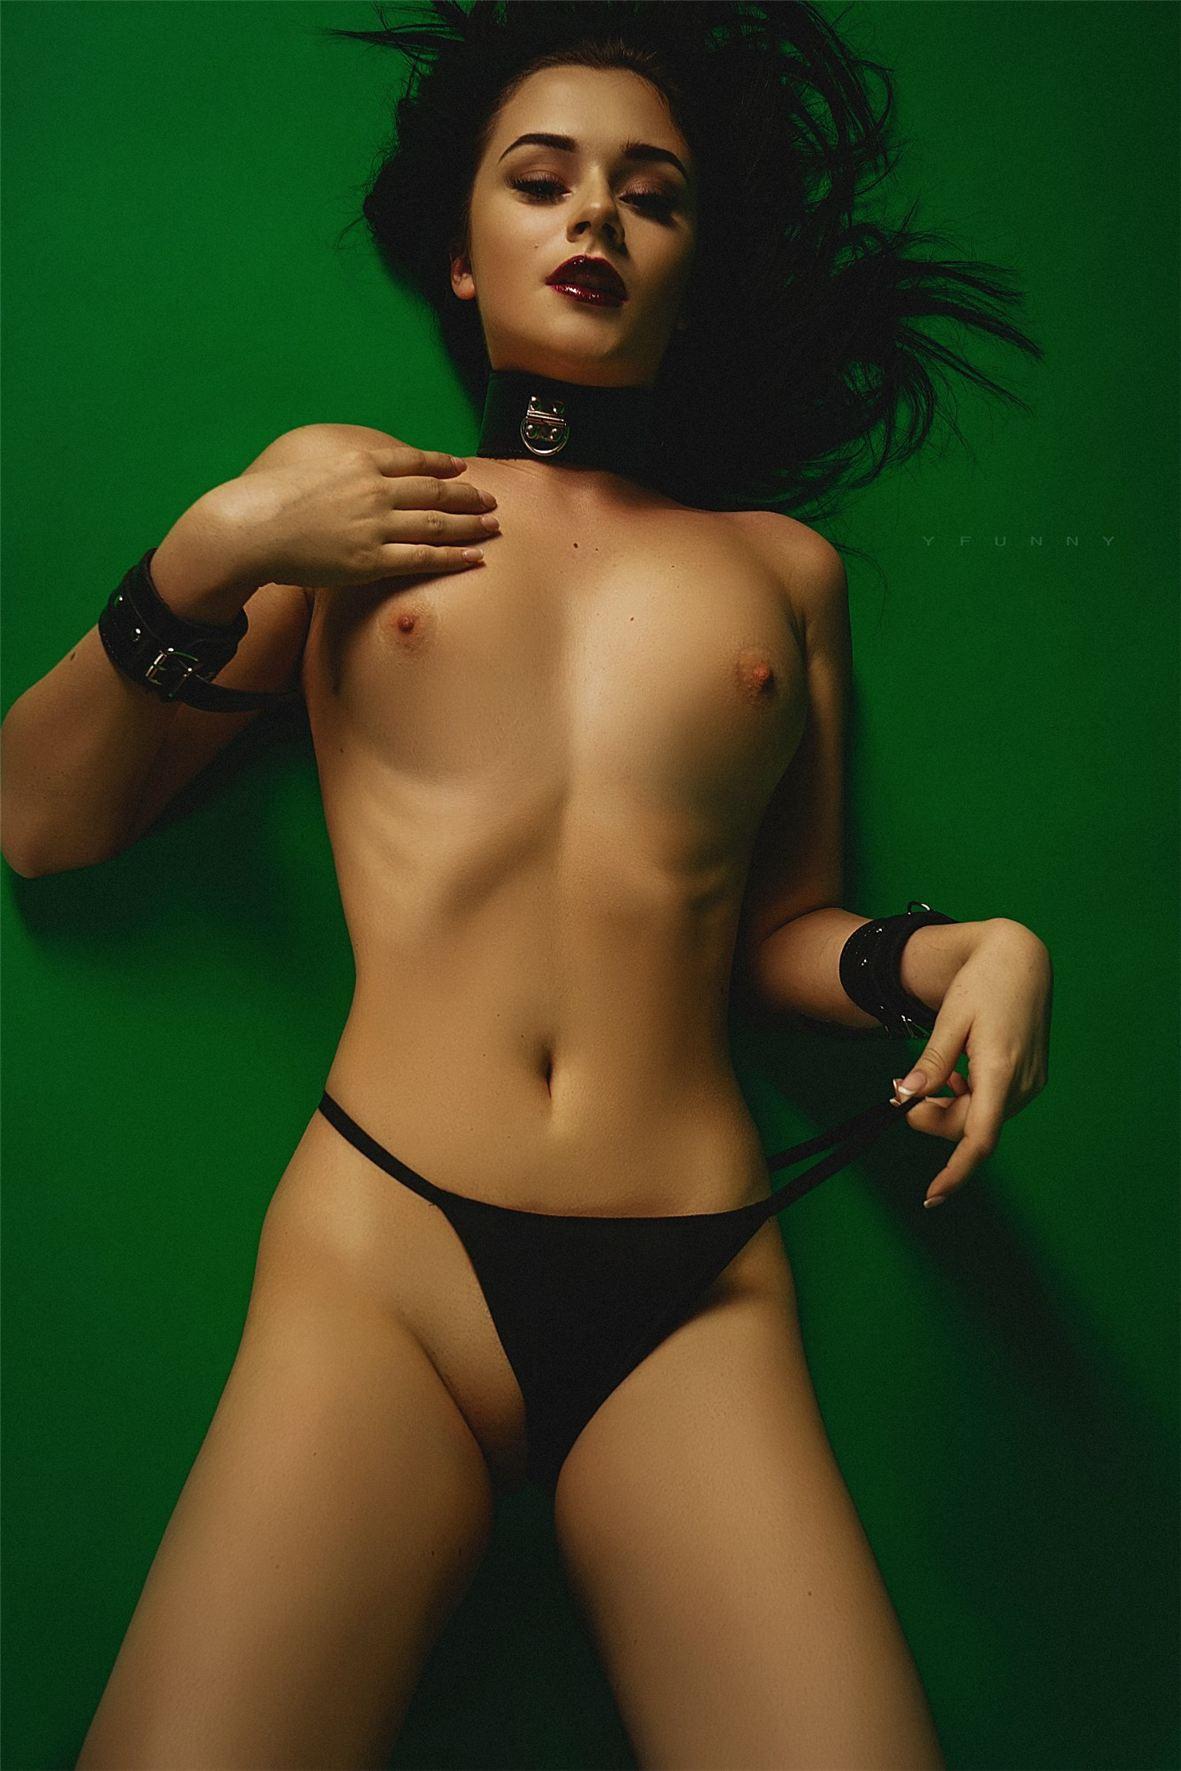 Голая Тоня (18+) sexy nude by Nikolay Khvatov